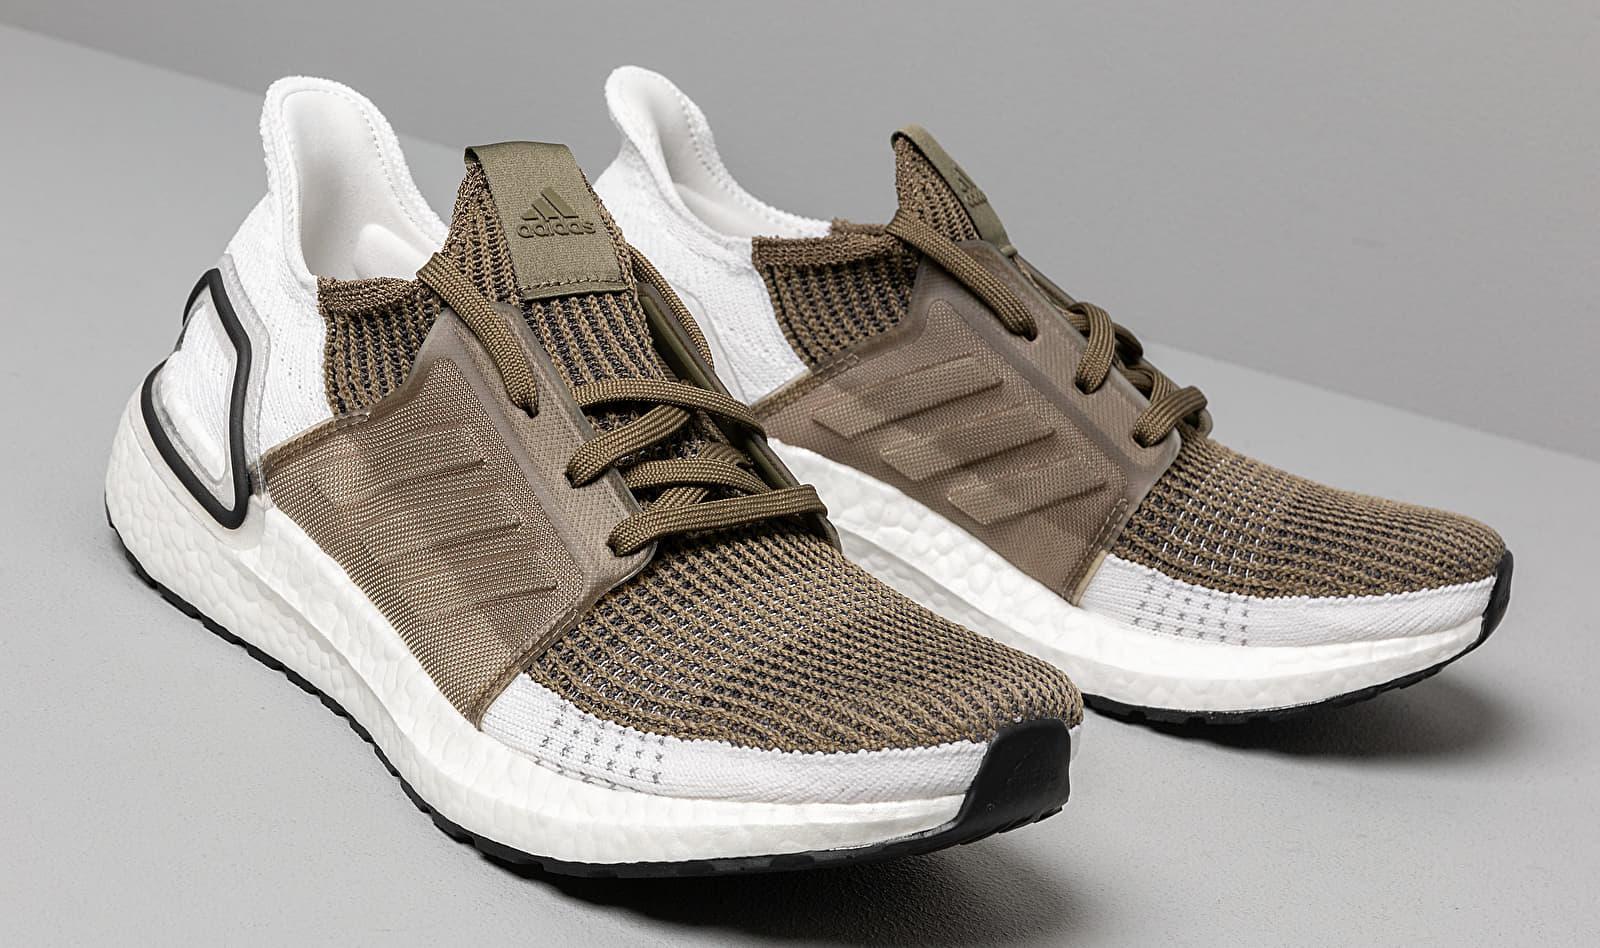 Adidas Ultraboost 19 Raw Khaki/ Raw Khaki/ Core Black